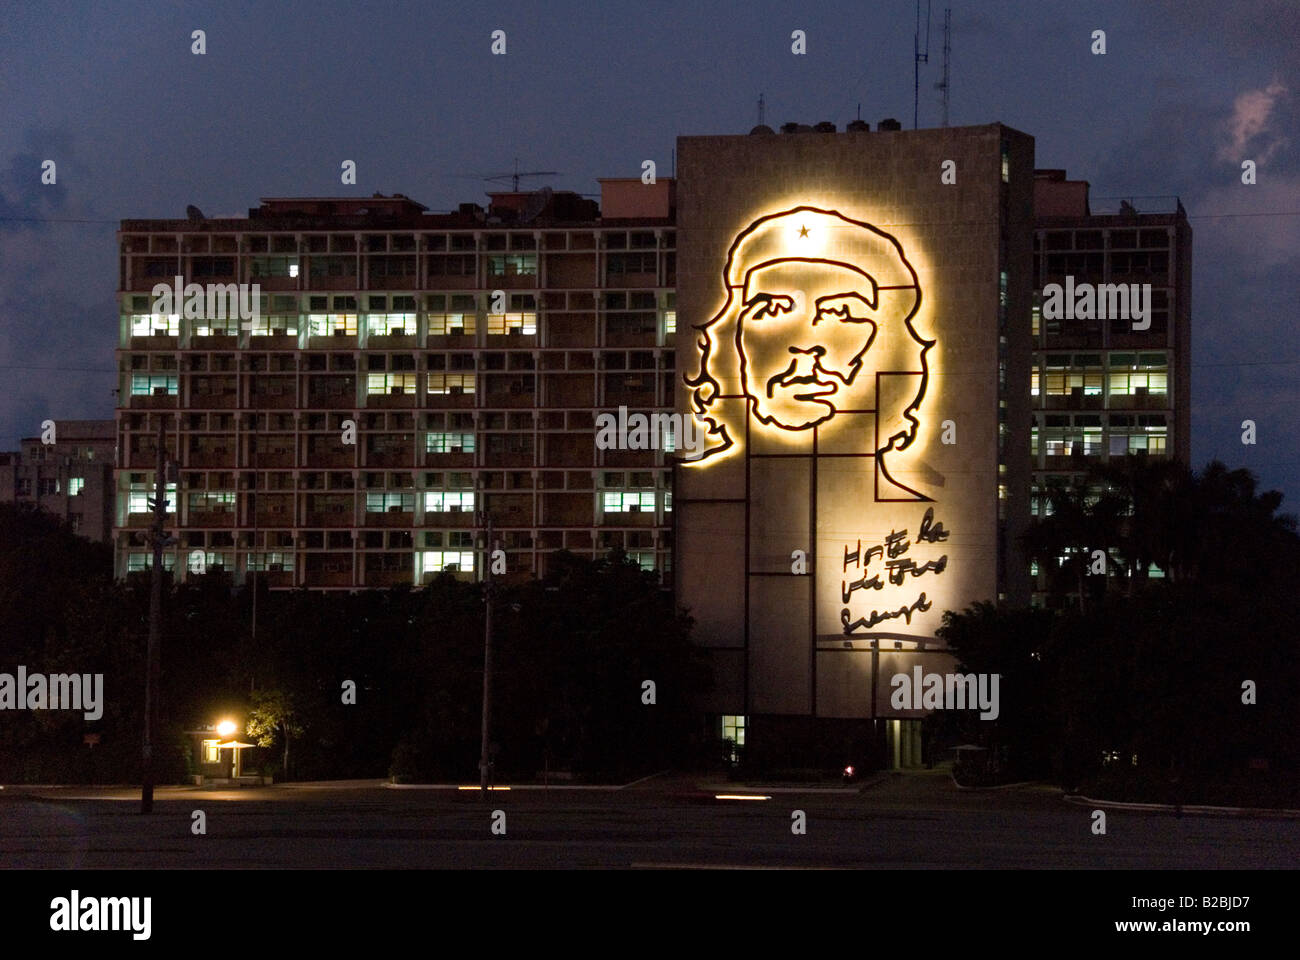 Ernest Che Guevara Stahl Skulptur auf dem Innenministerium Gebäude Plaza De La Revolucion in Vedado Havanna Stockbild